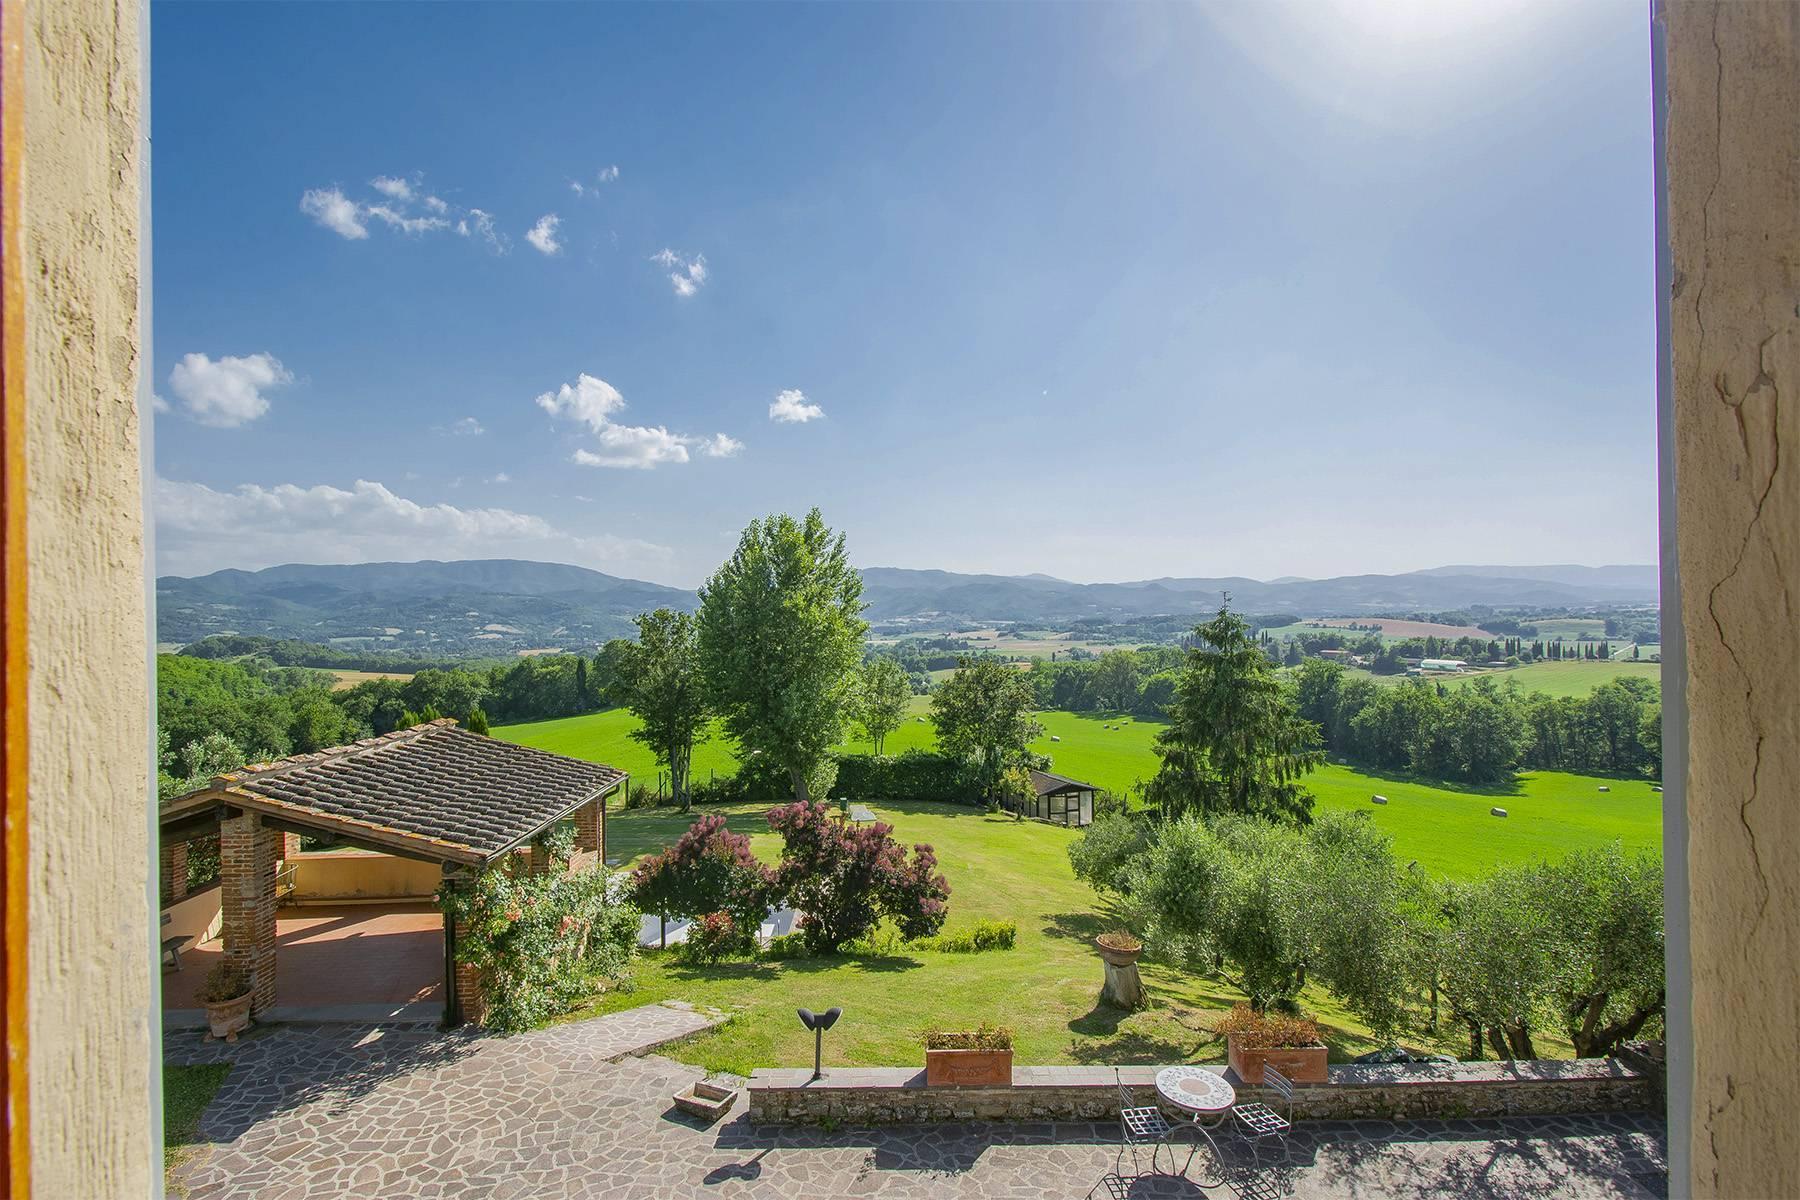 Farmhouse nestled on the Tuscan hills - 6